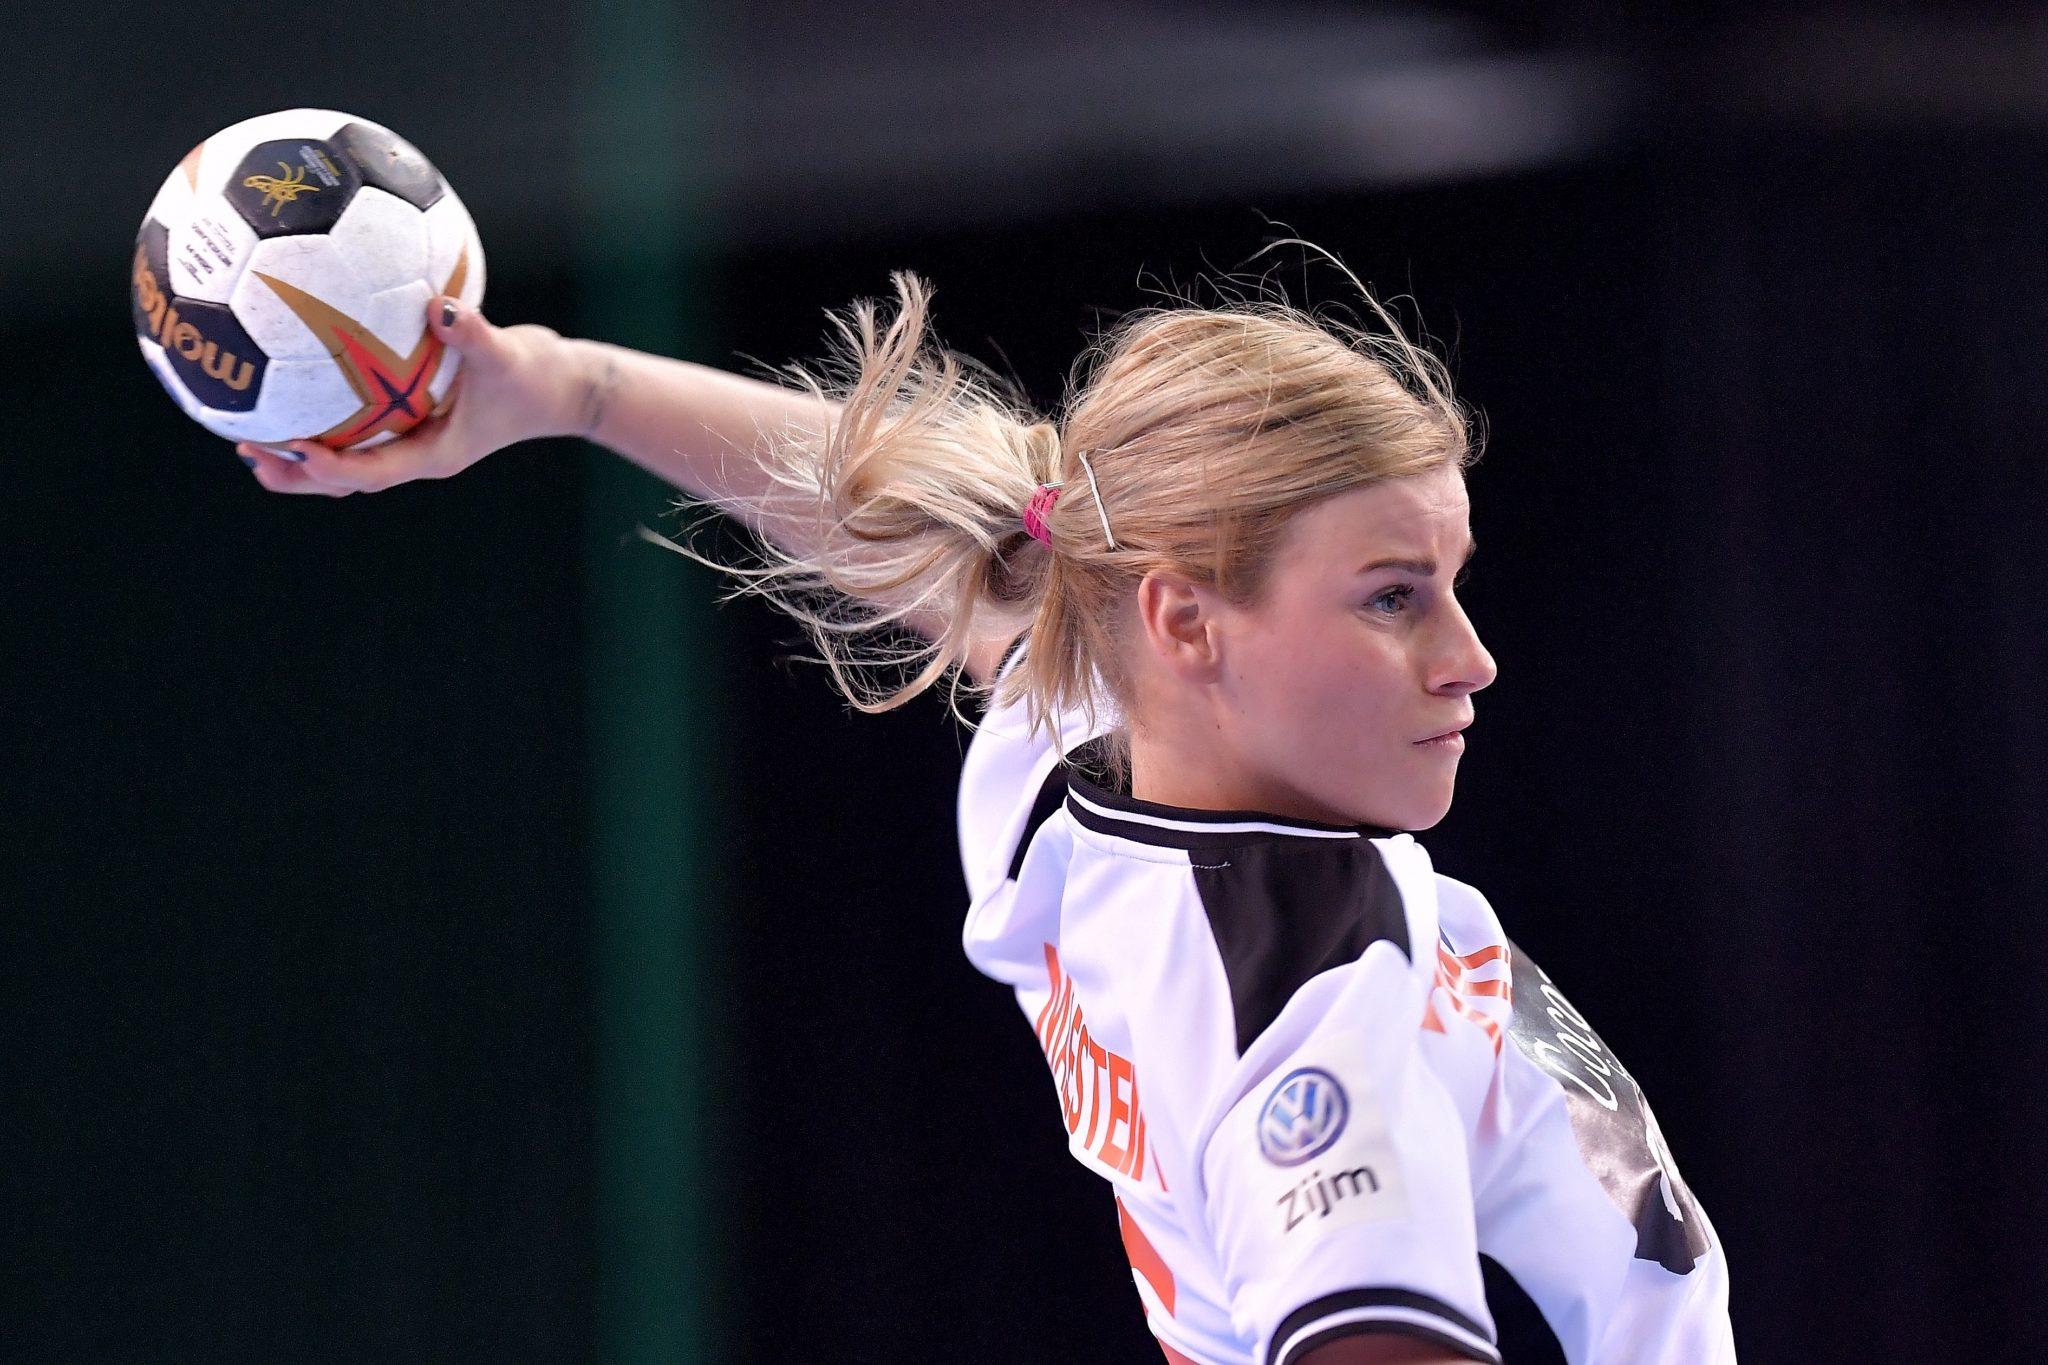 3-12-2017 HANDBAL:NEDERLAND-CHINA:LEIPZIG WK Handbal Dames 2017 Nederland - China Angela Malestein #26 NED  Foto: Henk Seppen